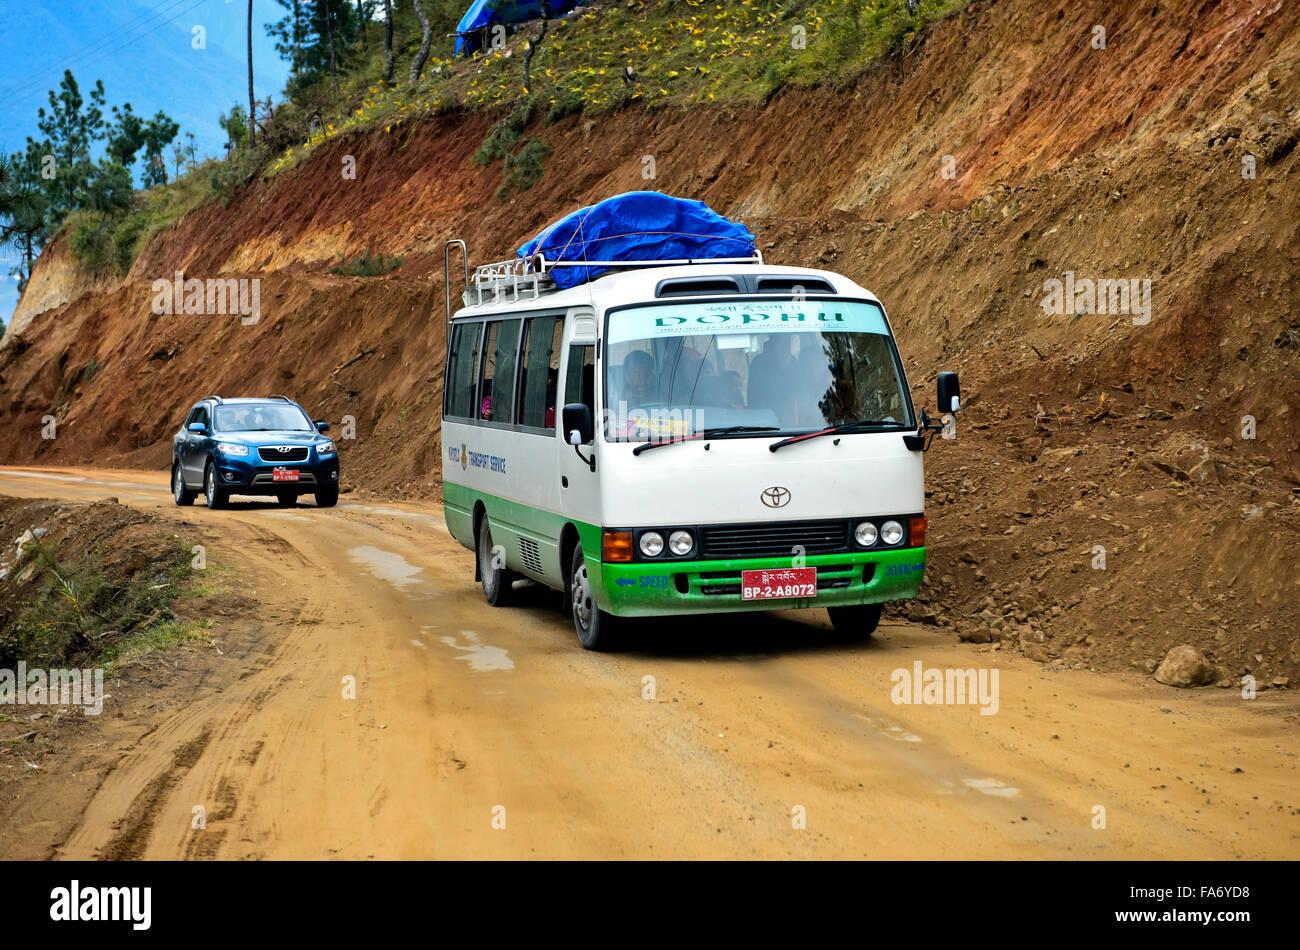 Local bus transportation on the Thimphu Punakha Highway, Bhutan - Stock Image